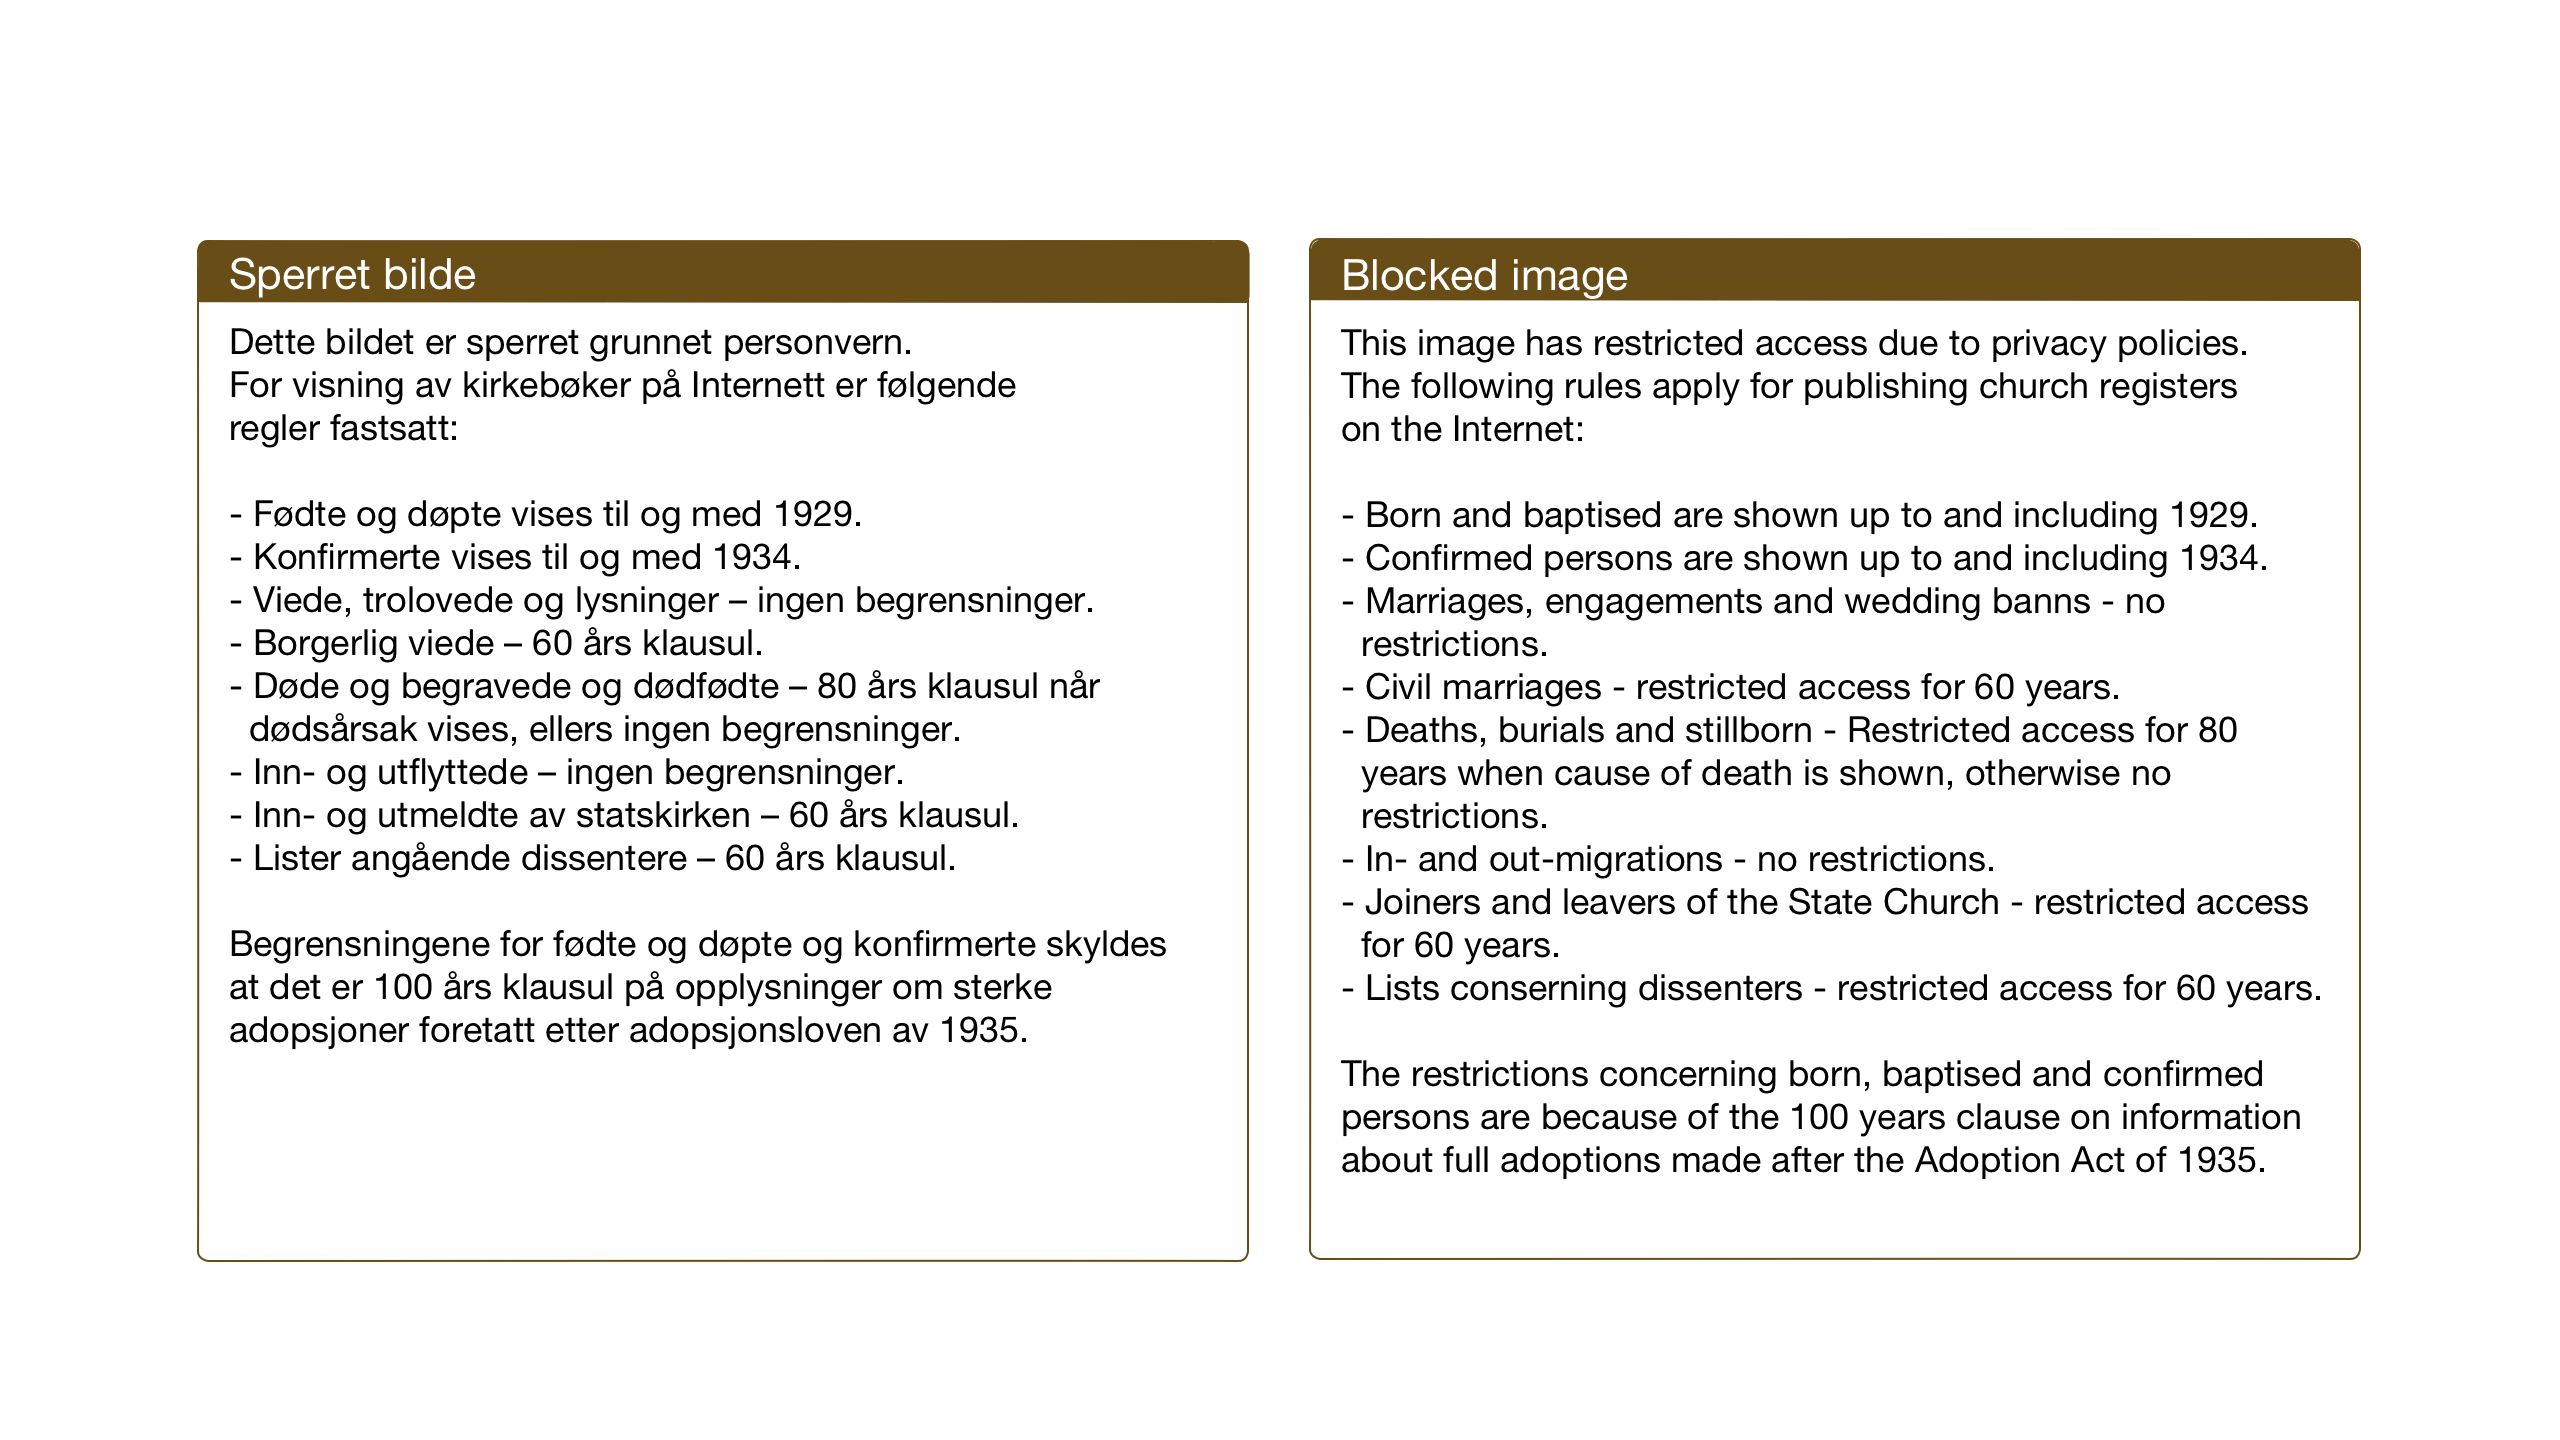 SAT, Ministerialprotokoller, klokkerbøker og fødselsregistre - Nordland, 847/L0680: Klokkerbok nr. 847C08, 1930-1947, s. 23